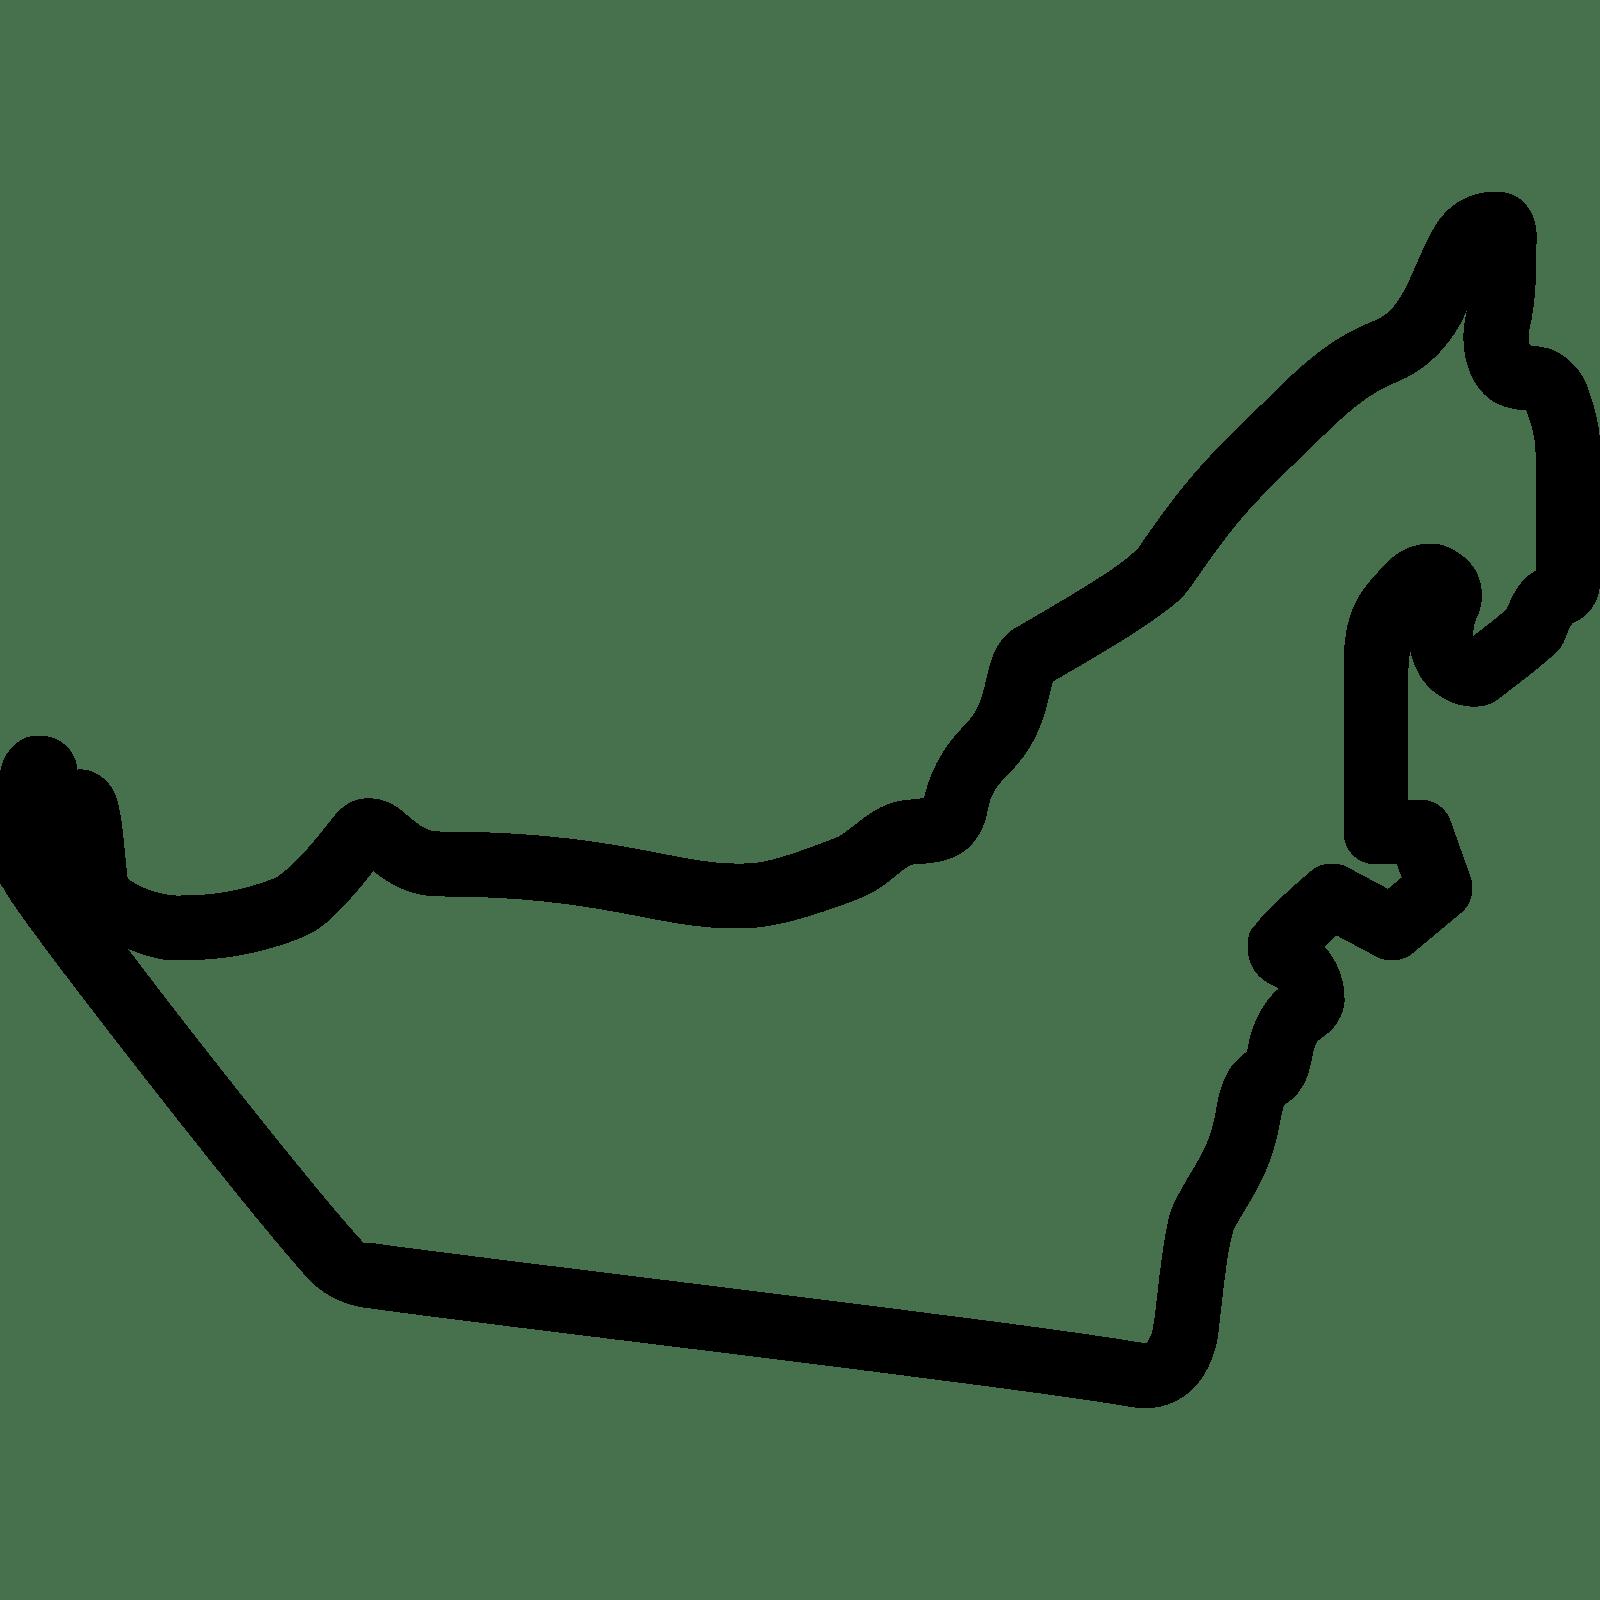 Uae Map Icon